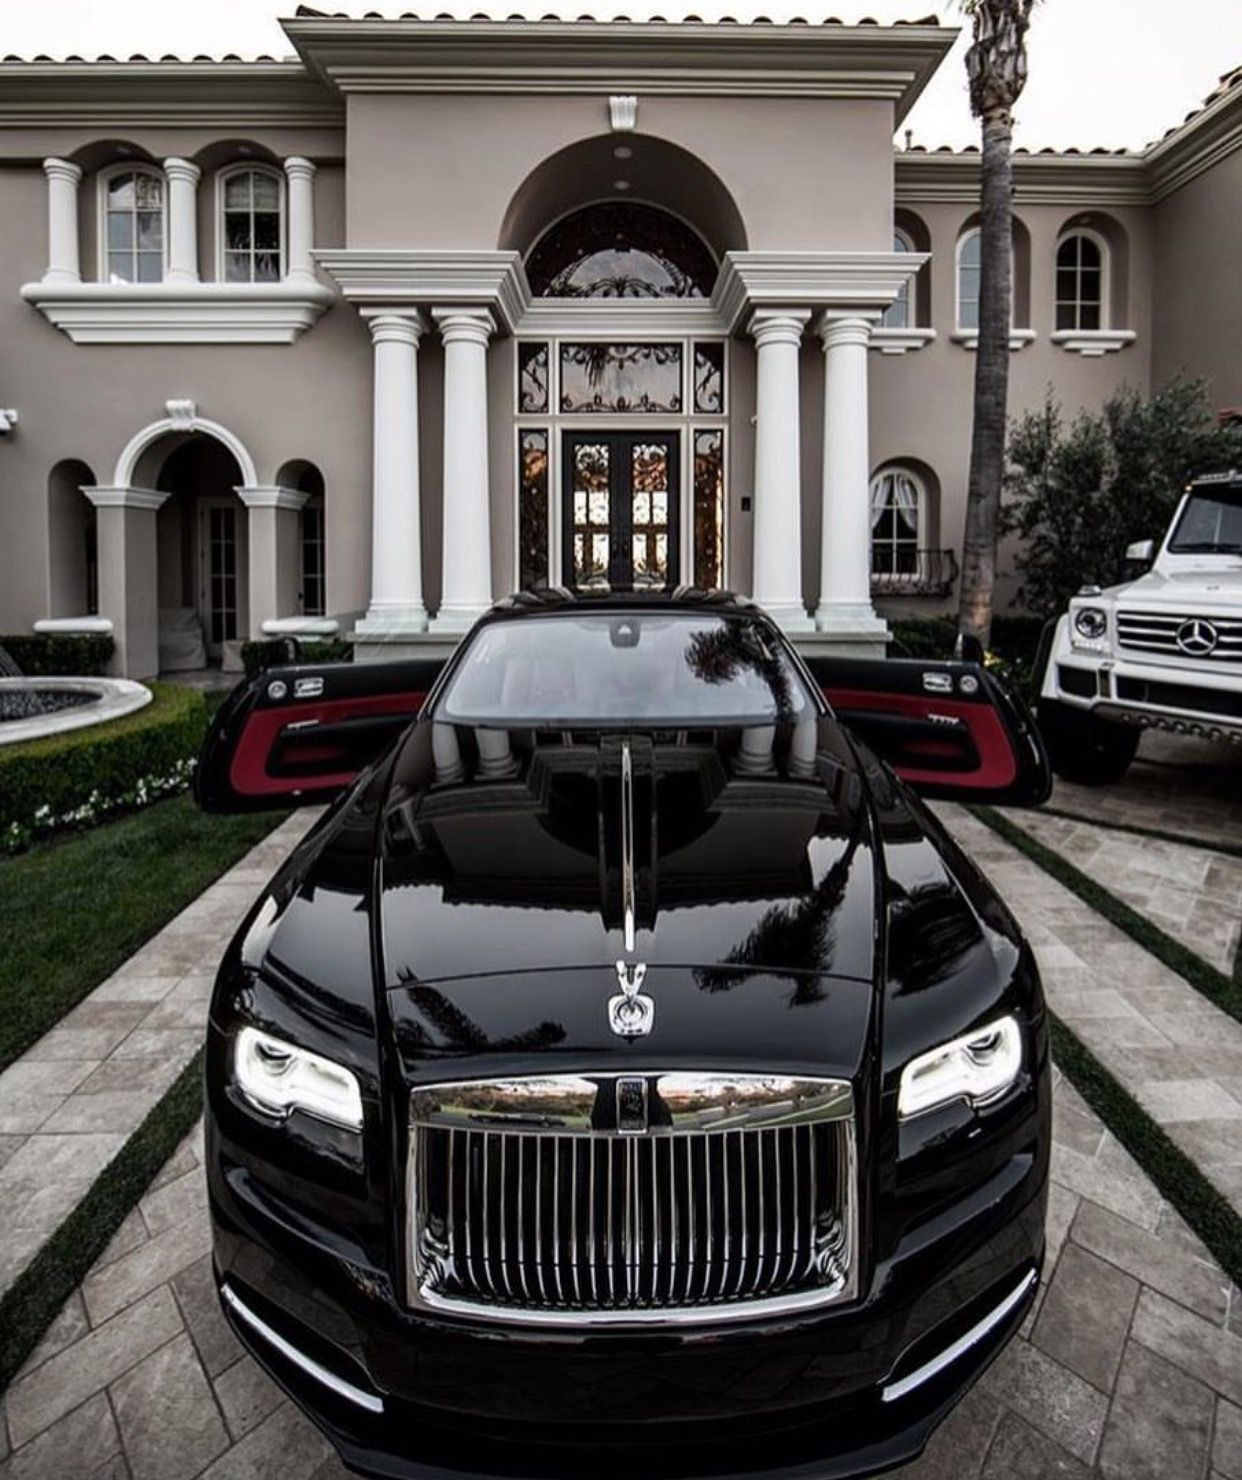 Rolls Royce www.ge-intl.com